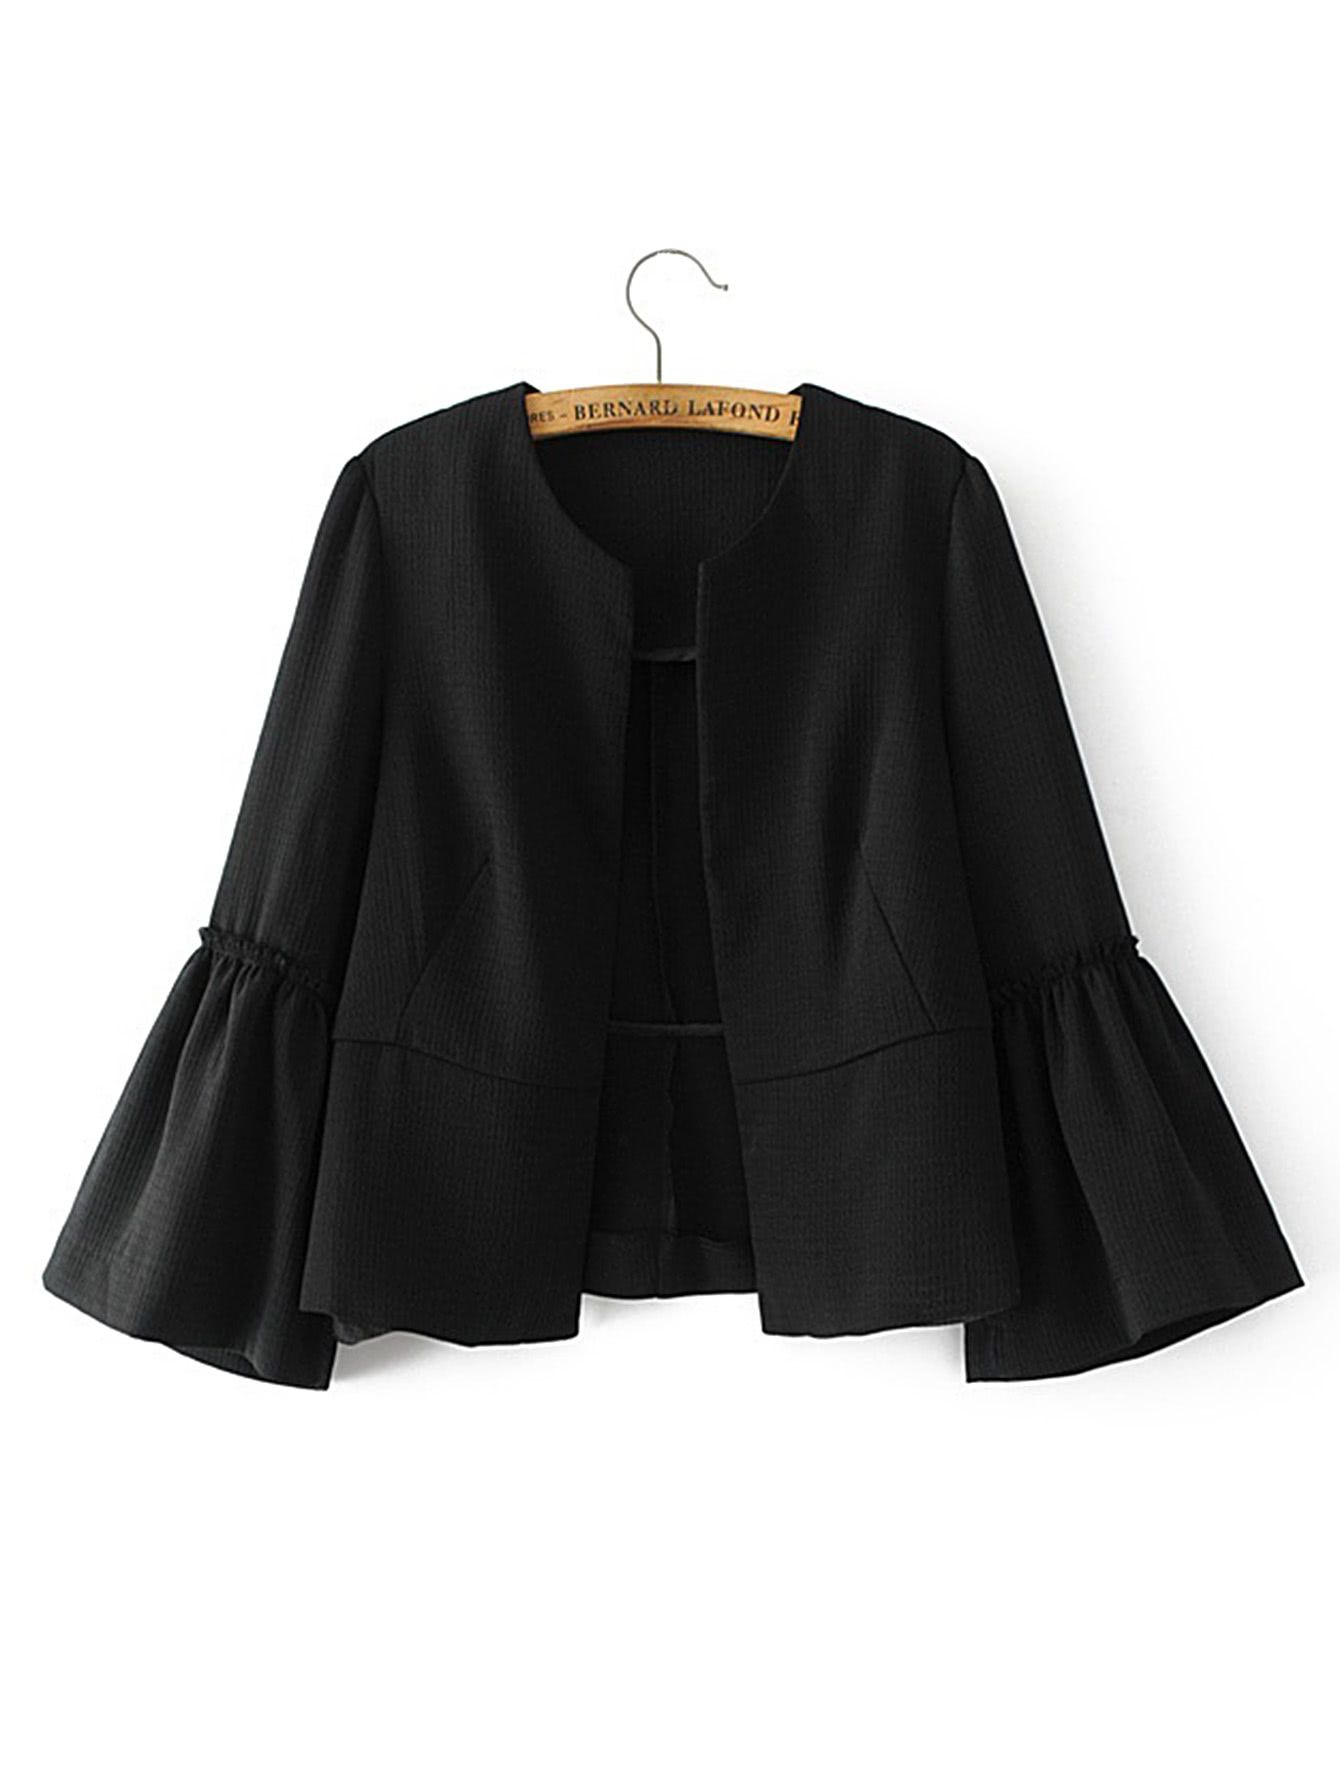 4011d956d1 Shop Bell Sleeve Frill Trim Blazer online. SheIn offers Bell Sleeve Frill  Trim Blazer   more to fit your fashionable needs.